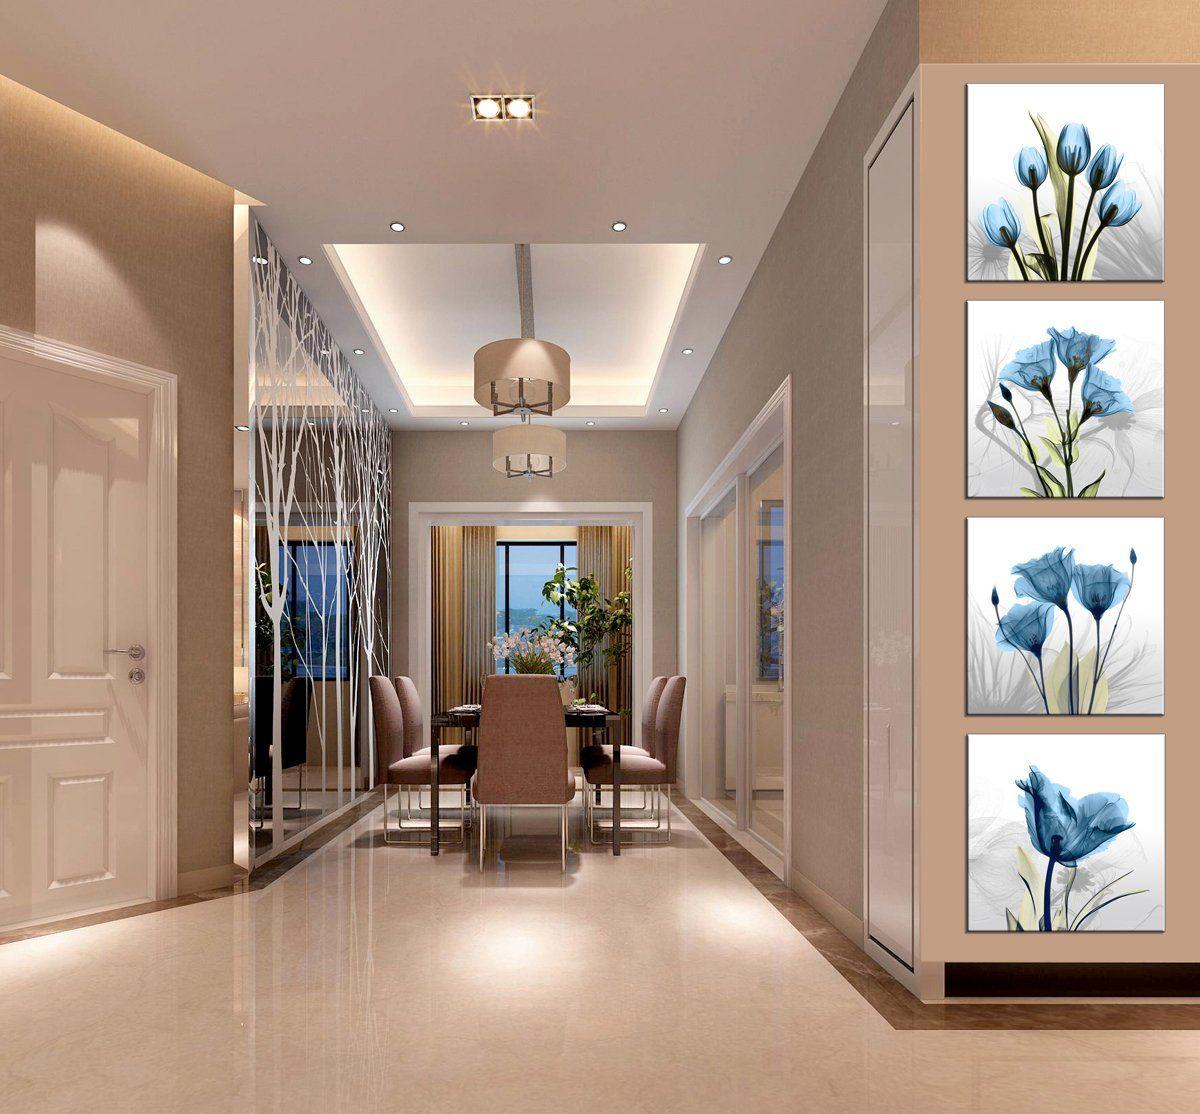 Moyedecor Art 4 Panel Elegant Tulip Flower Canvas Print